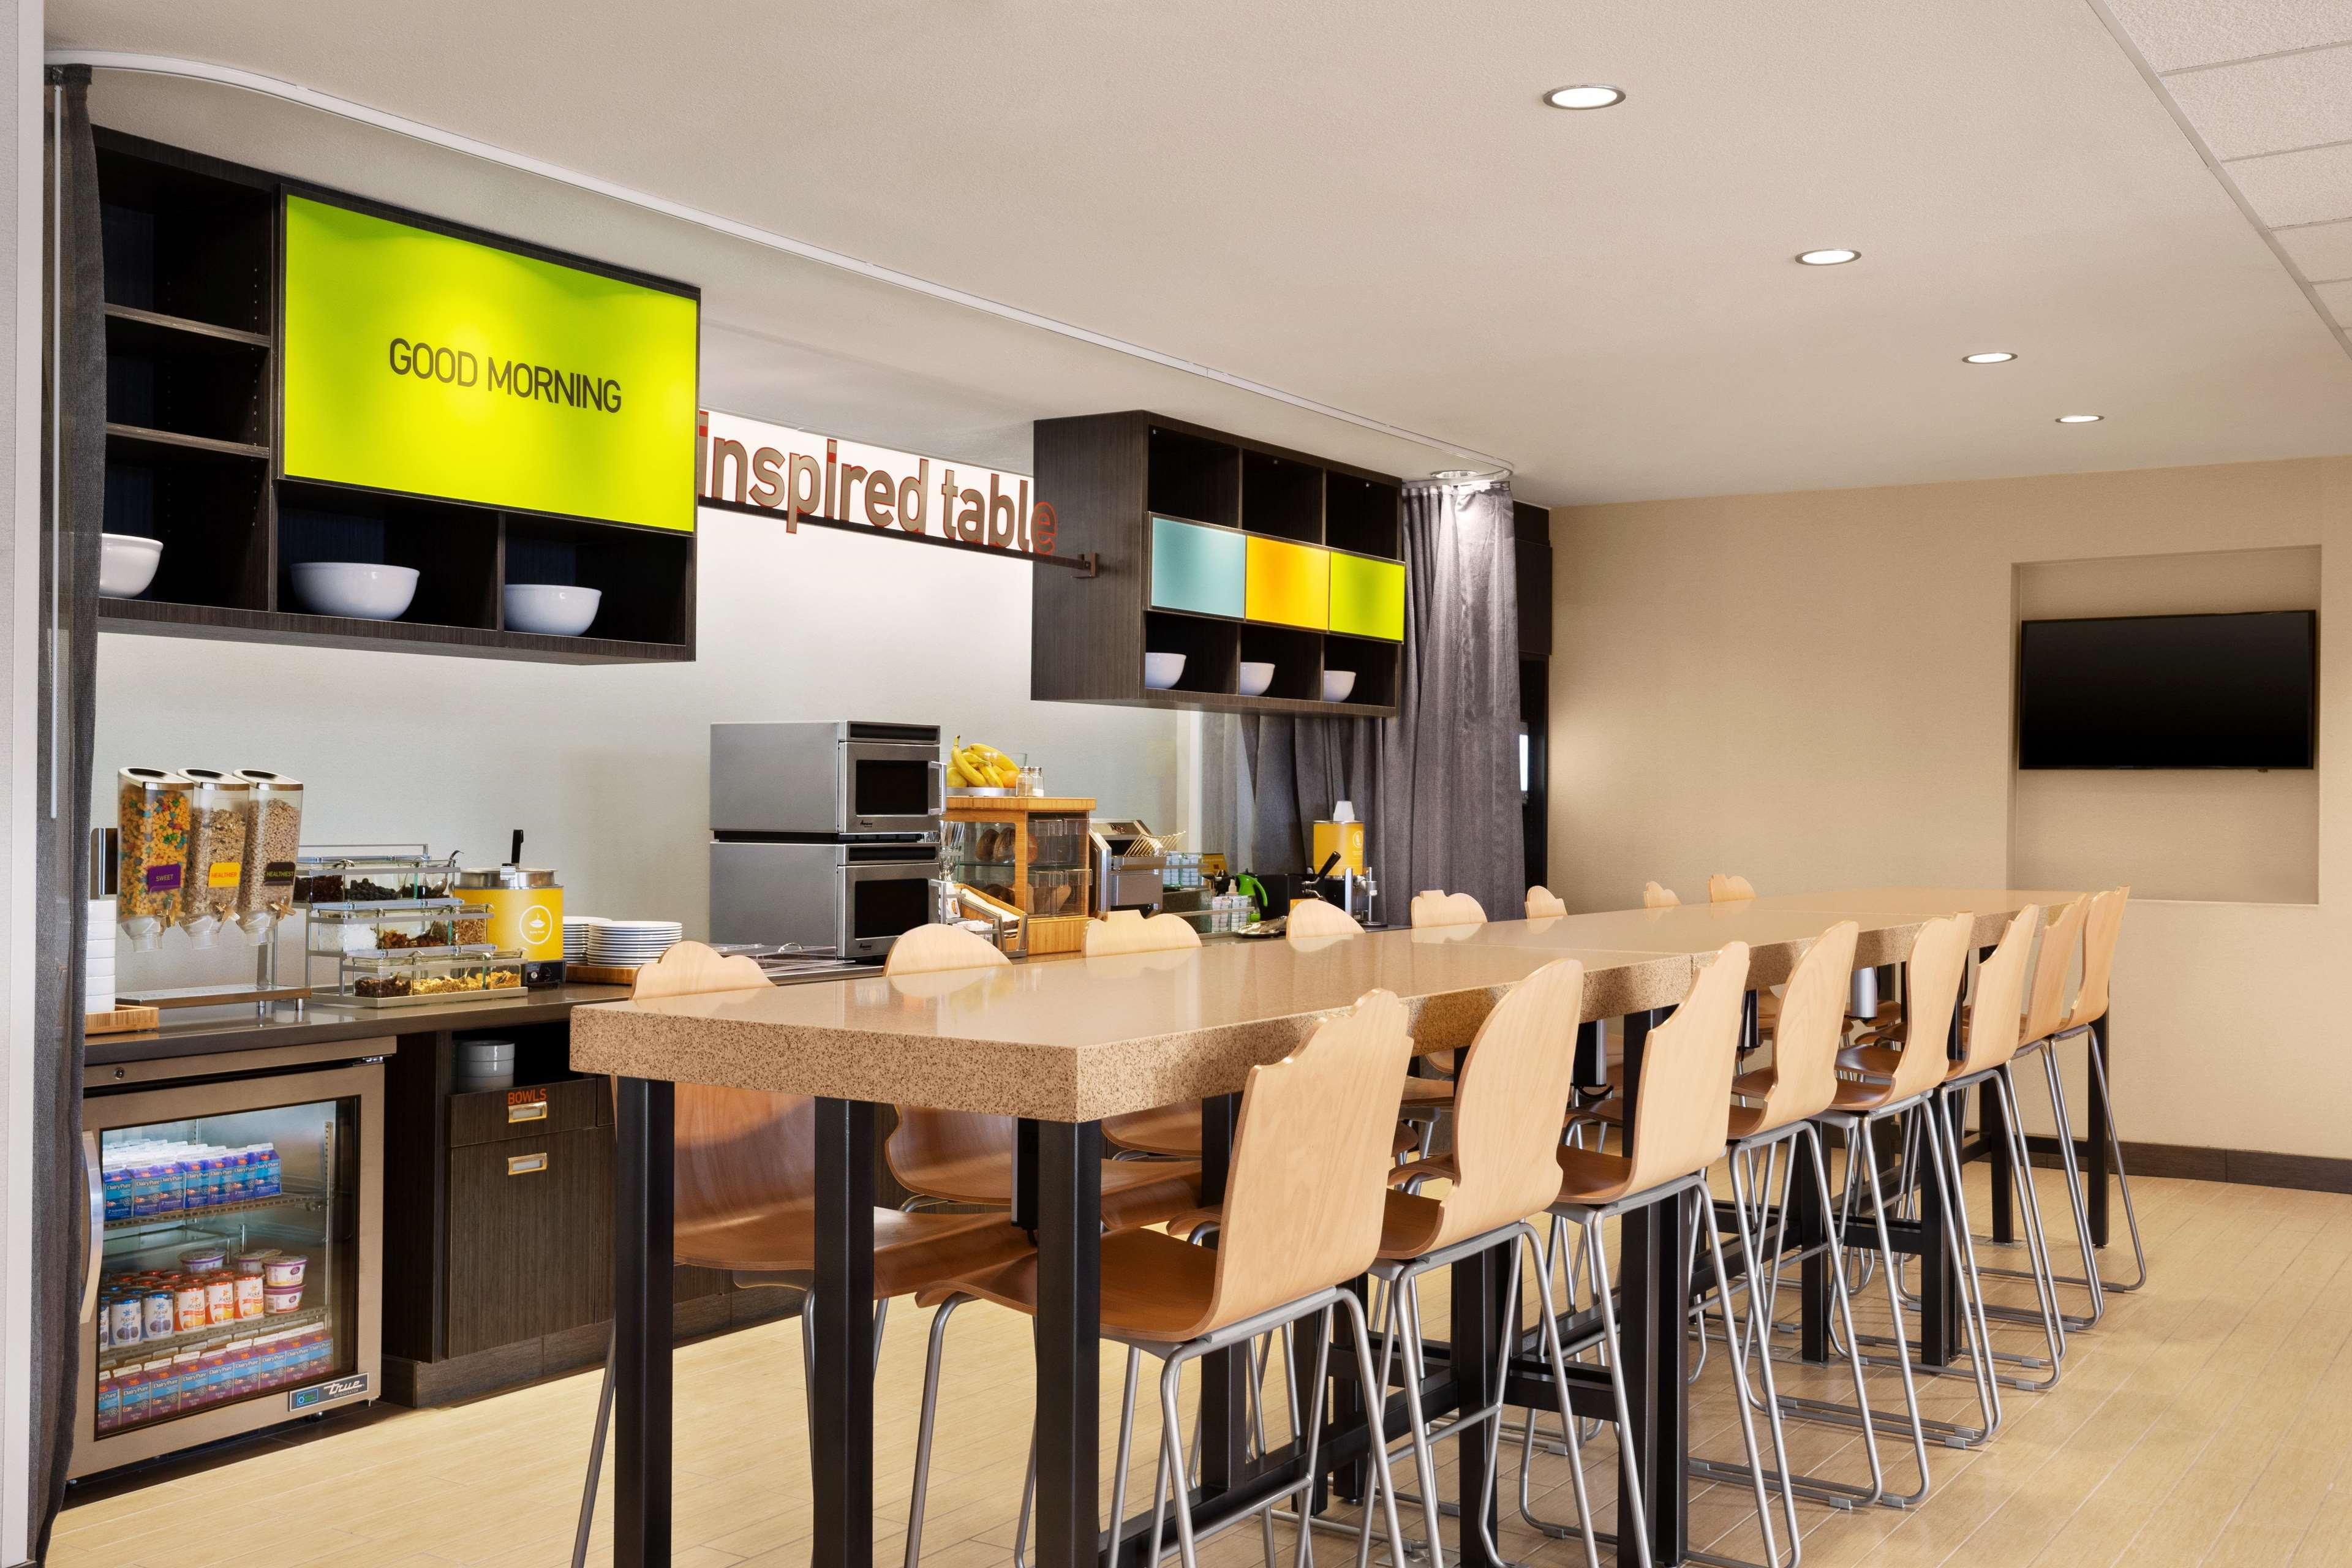 Home2 Suites by Hilton Elko image 11